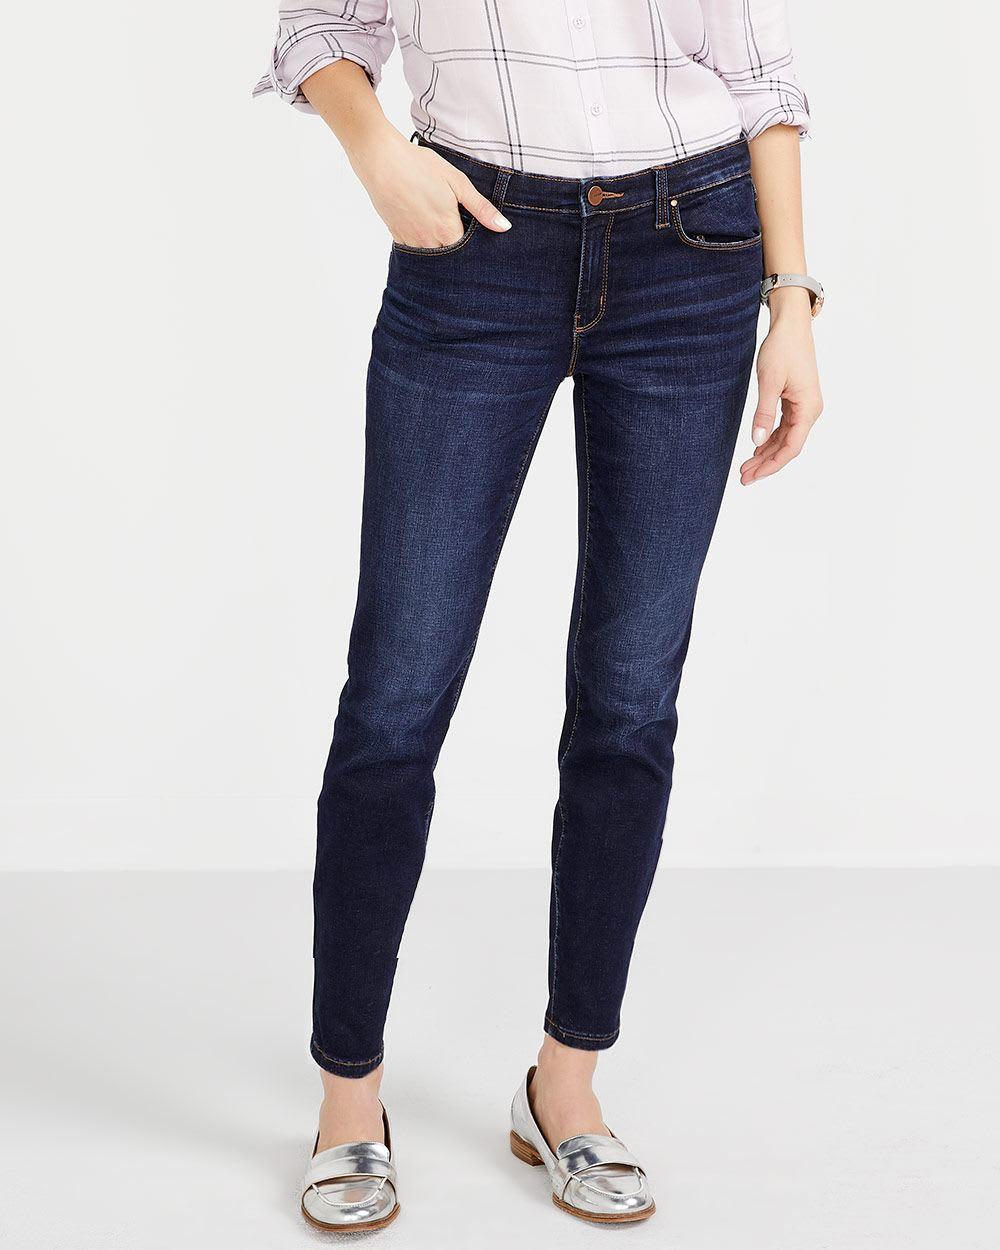 The Petite Skinny Sculpting Jeans